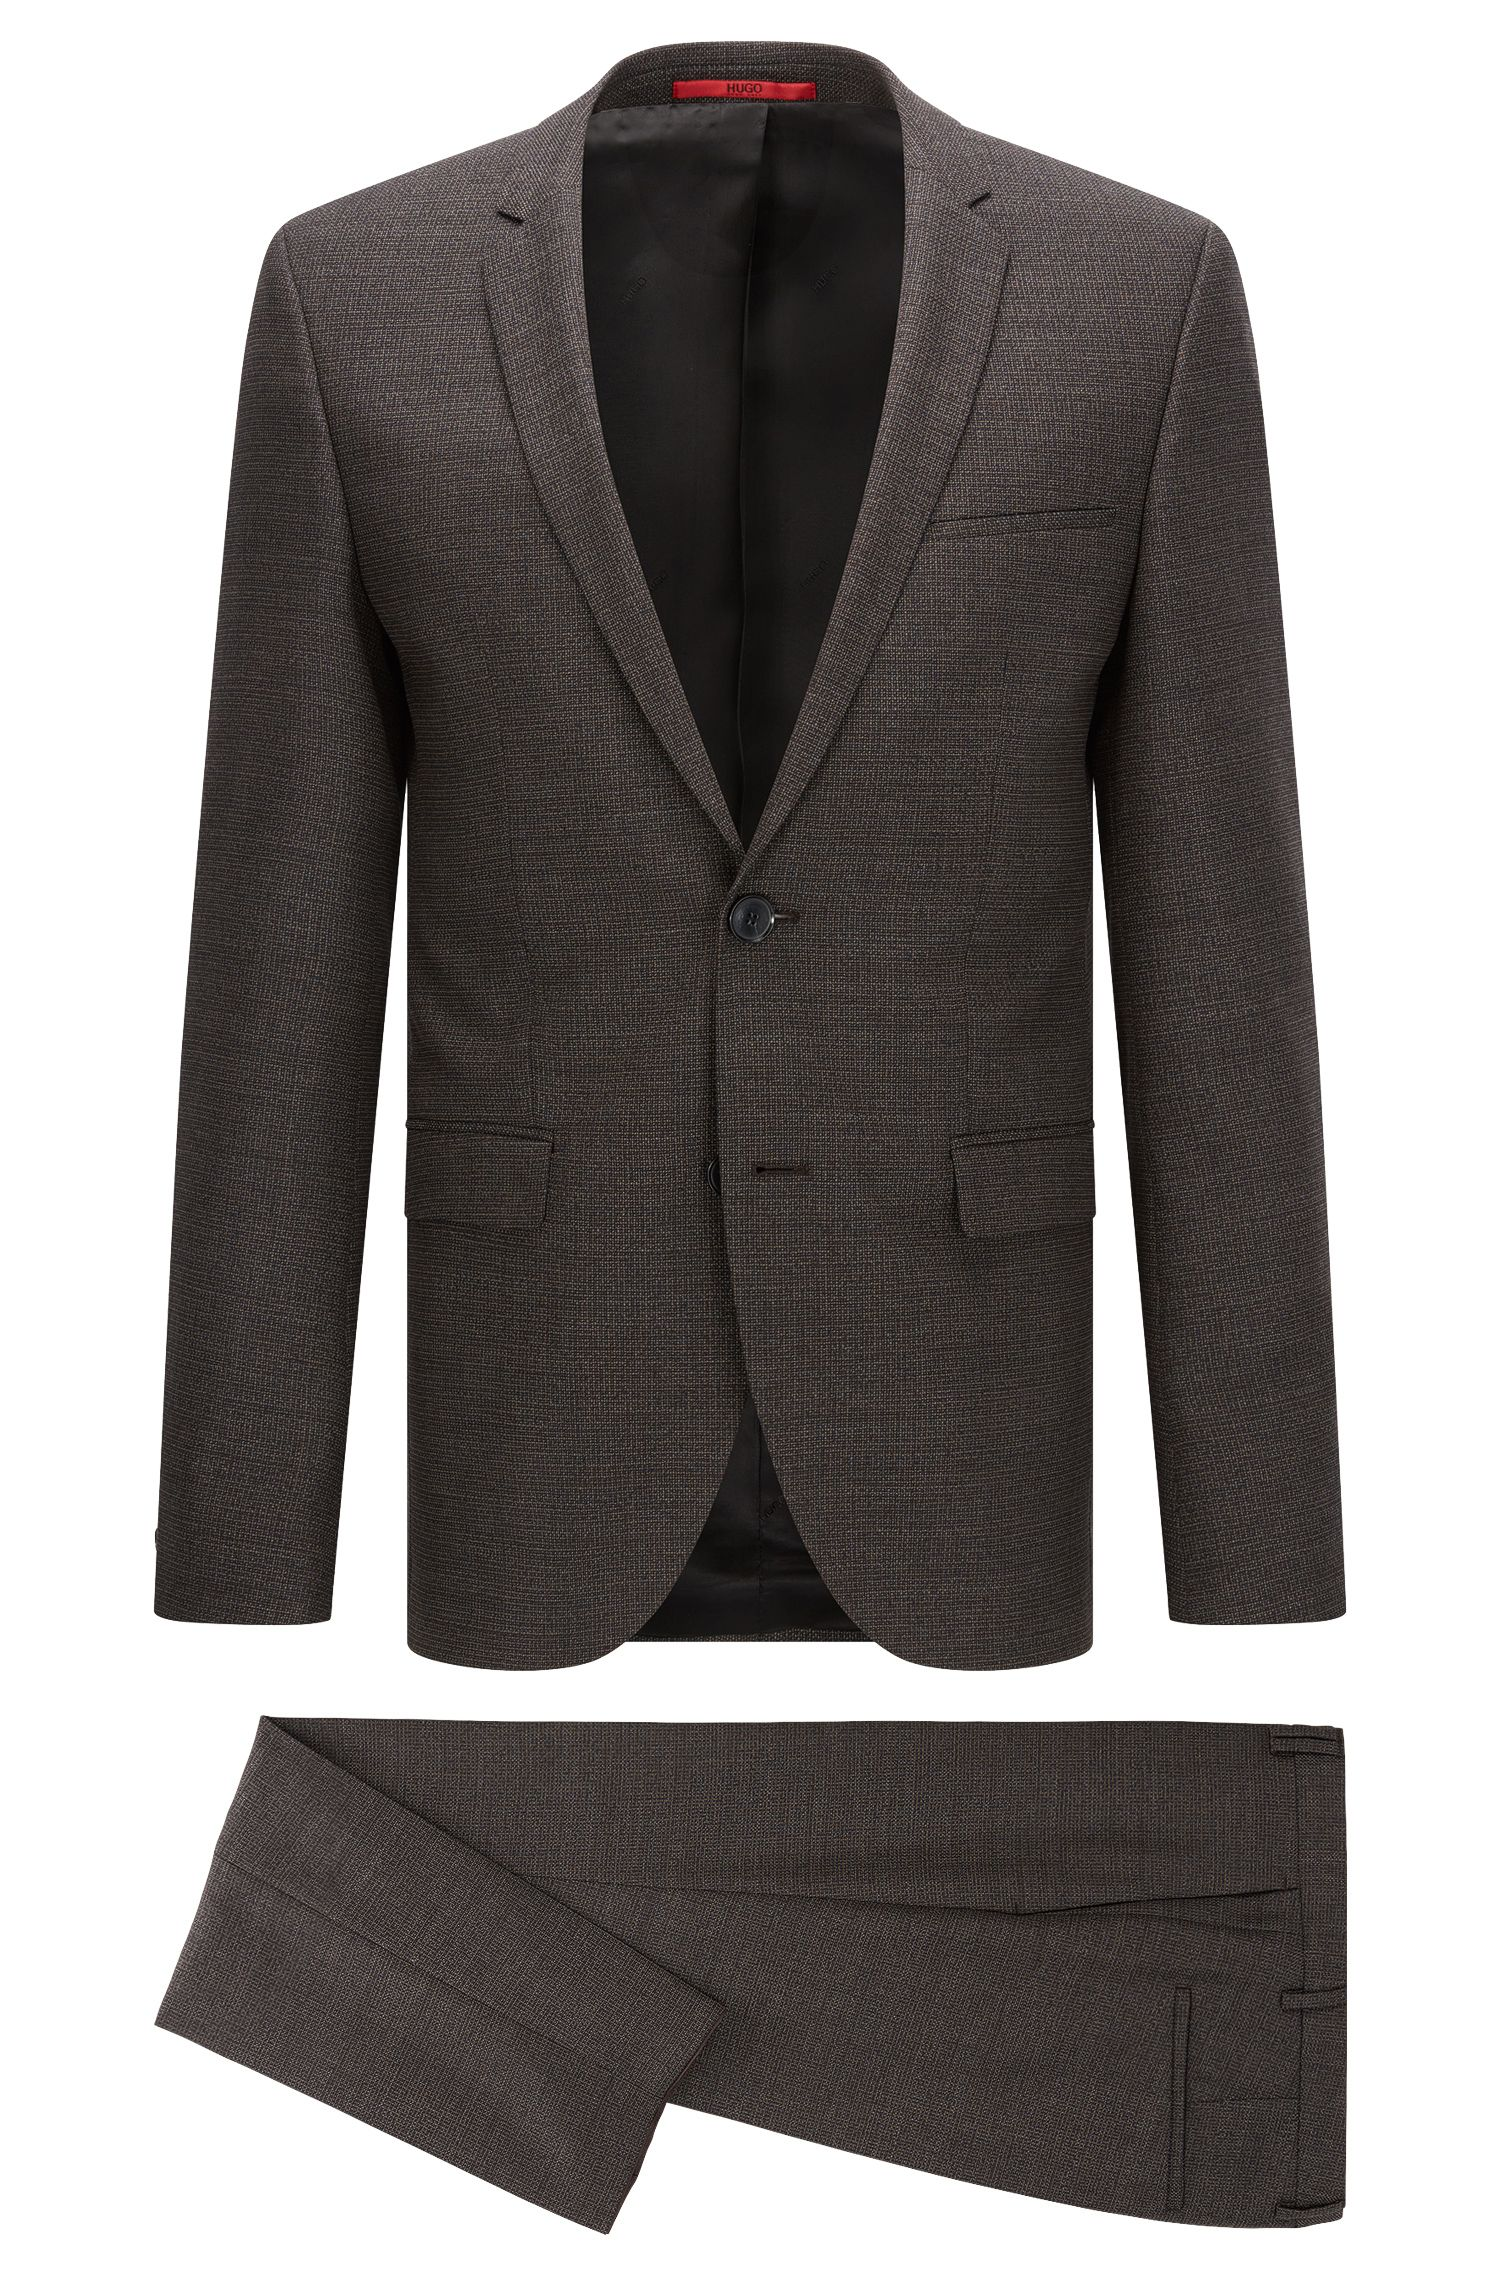 'Adris/Heilon' | Extra-Slim Fit, Windowpane Virgin Wool Suit